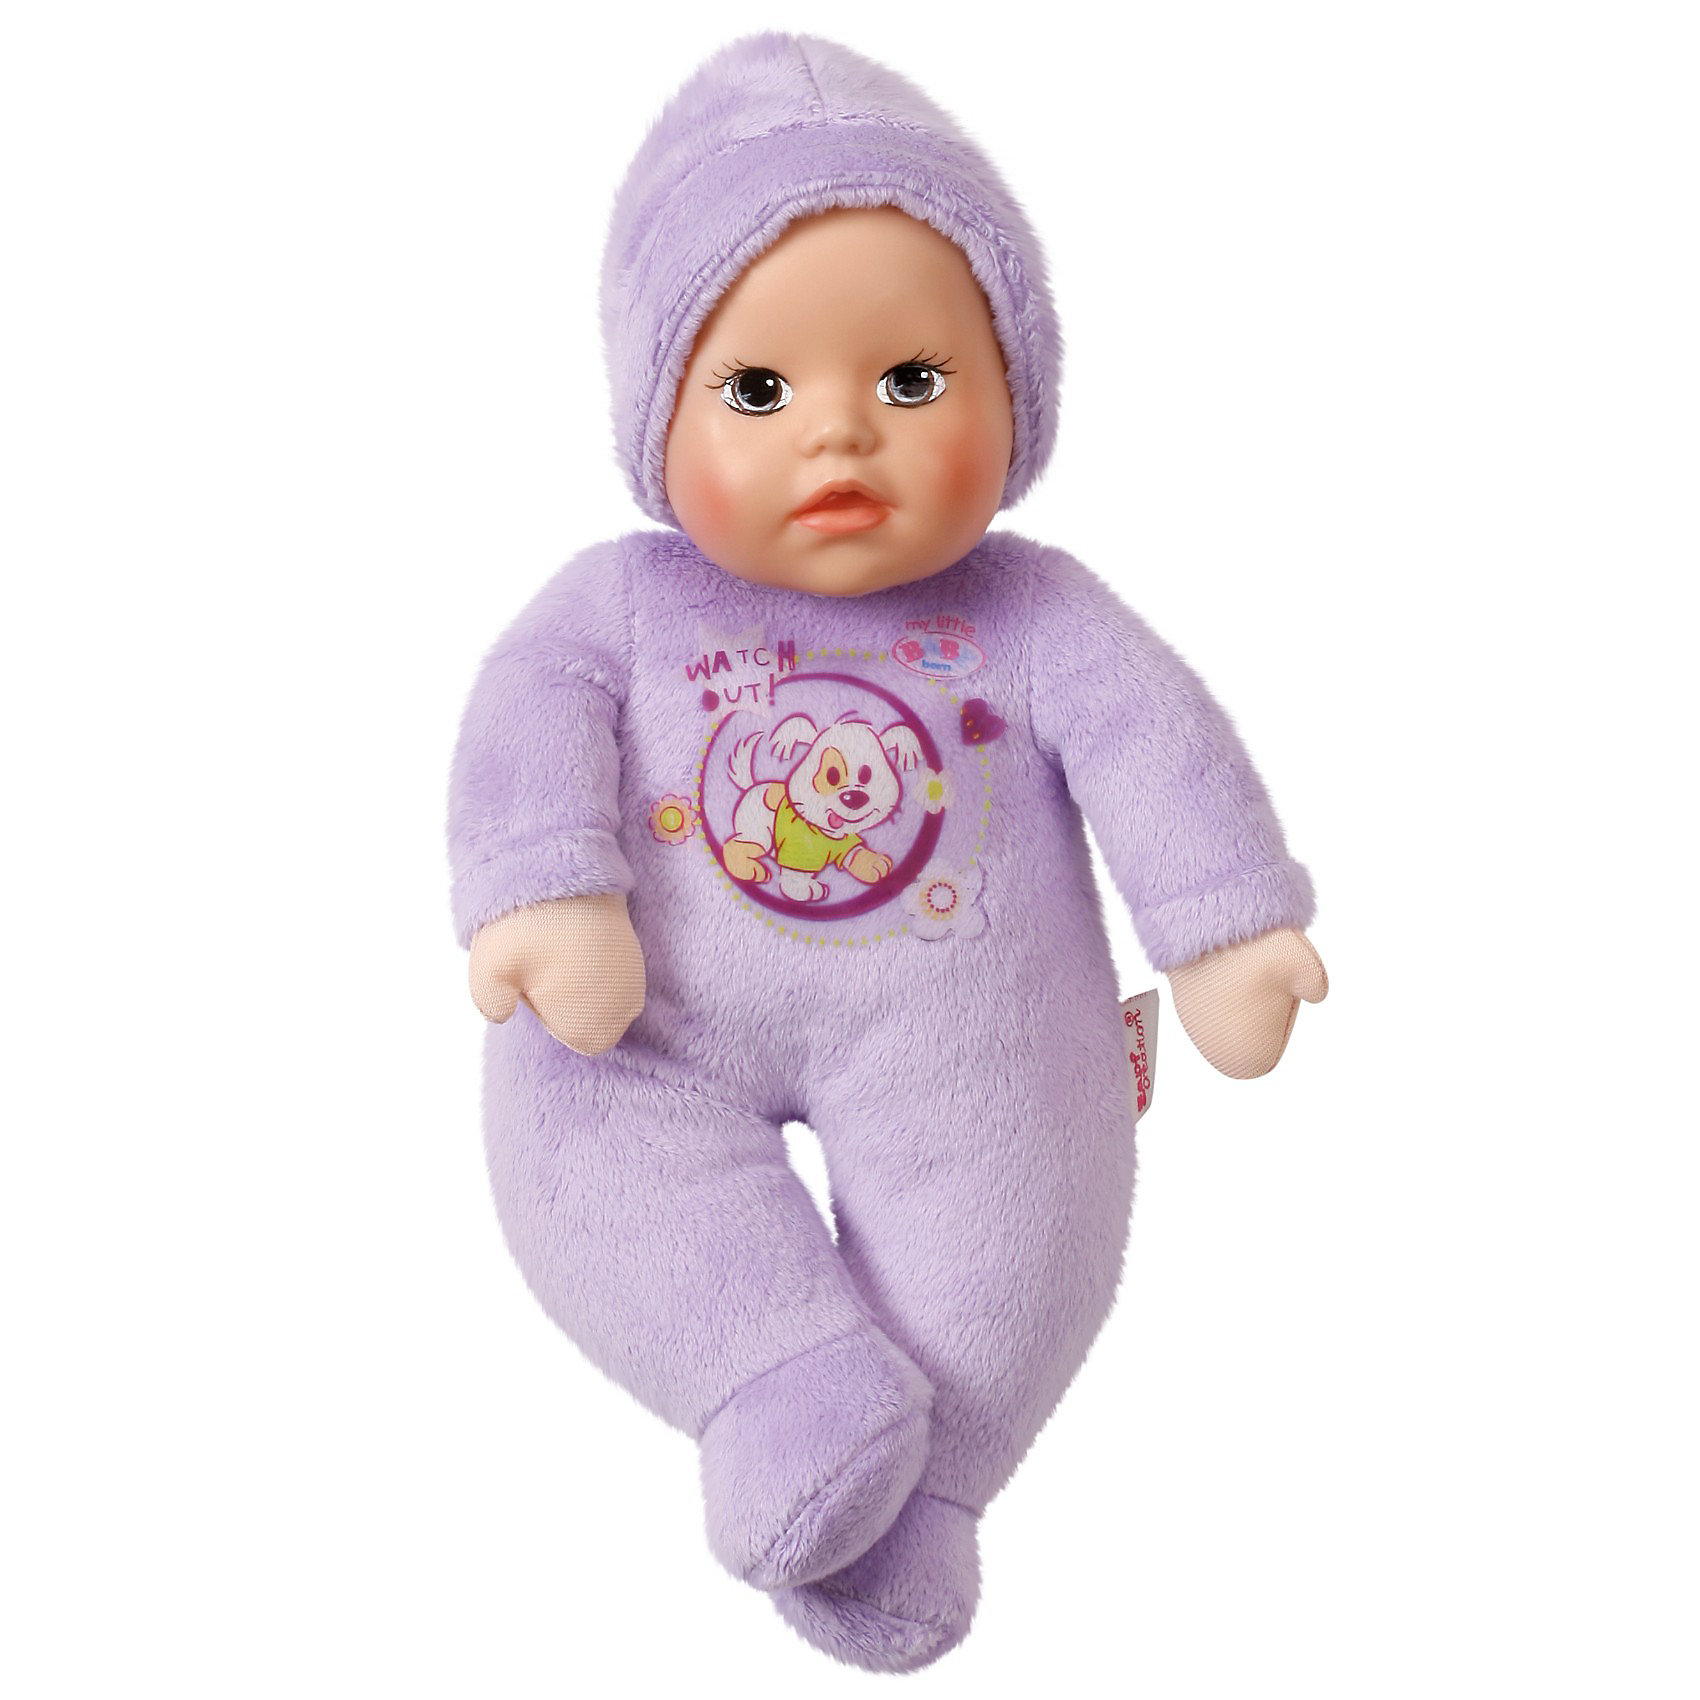 Кукла Супермягкая, 30 см, my little BABY born, в ассортименте